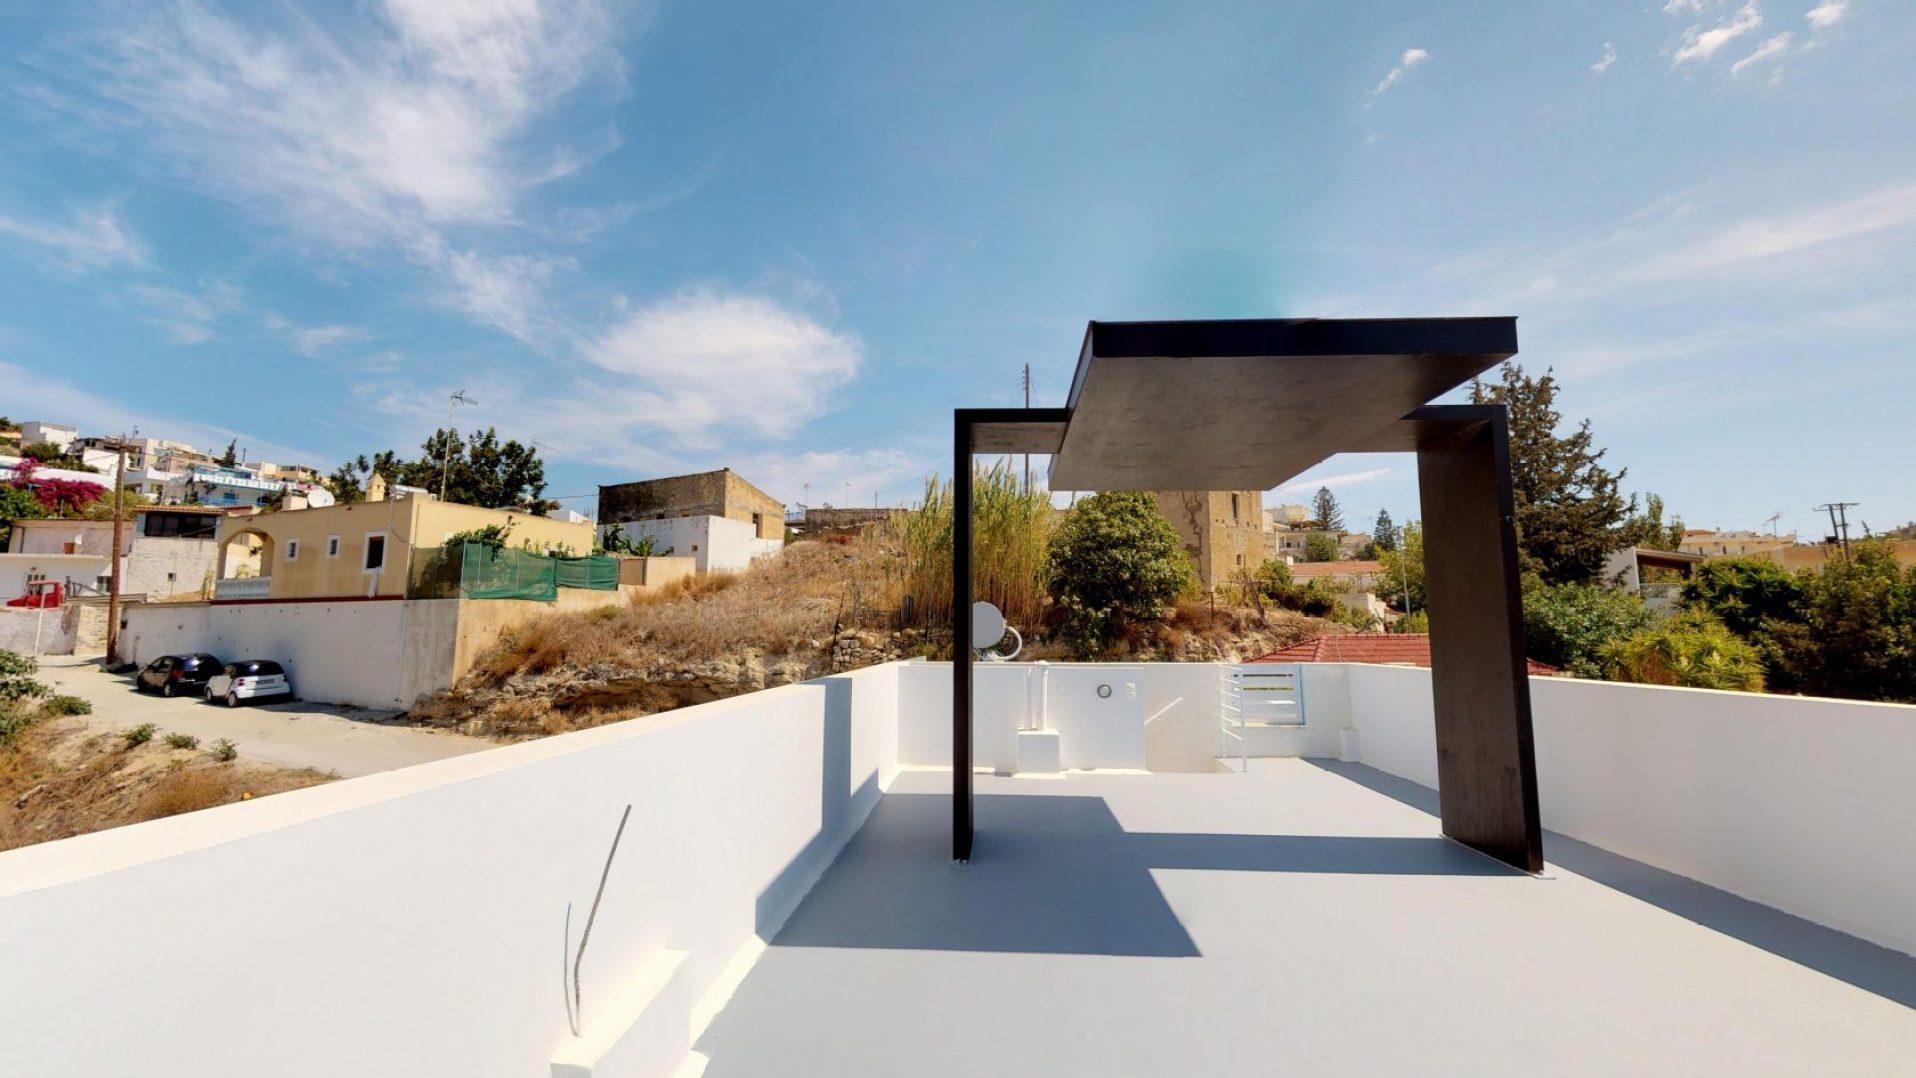 Faskomilia-Kamilari-Creta-Roof-2